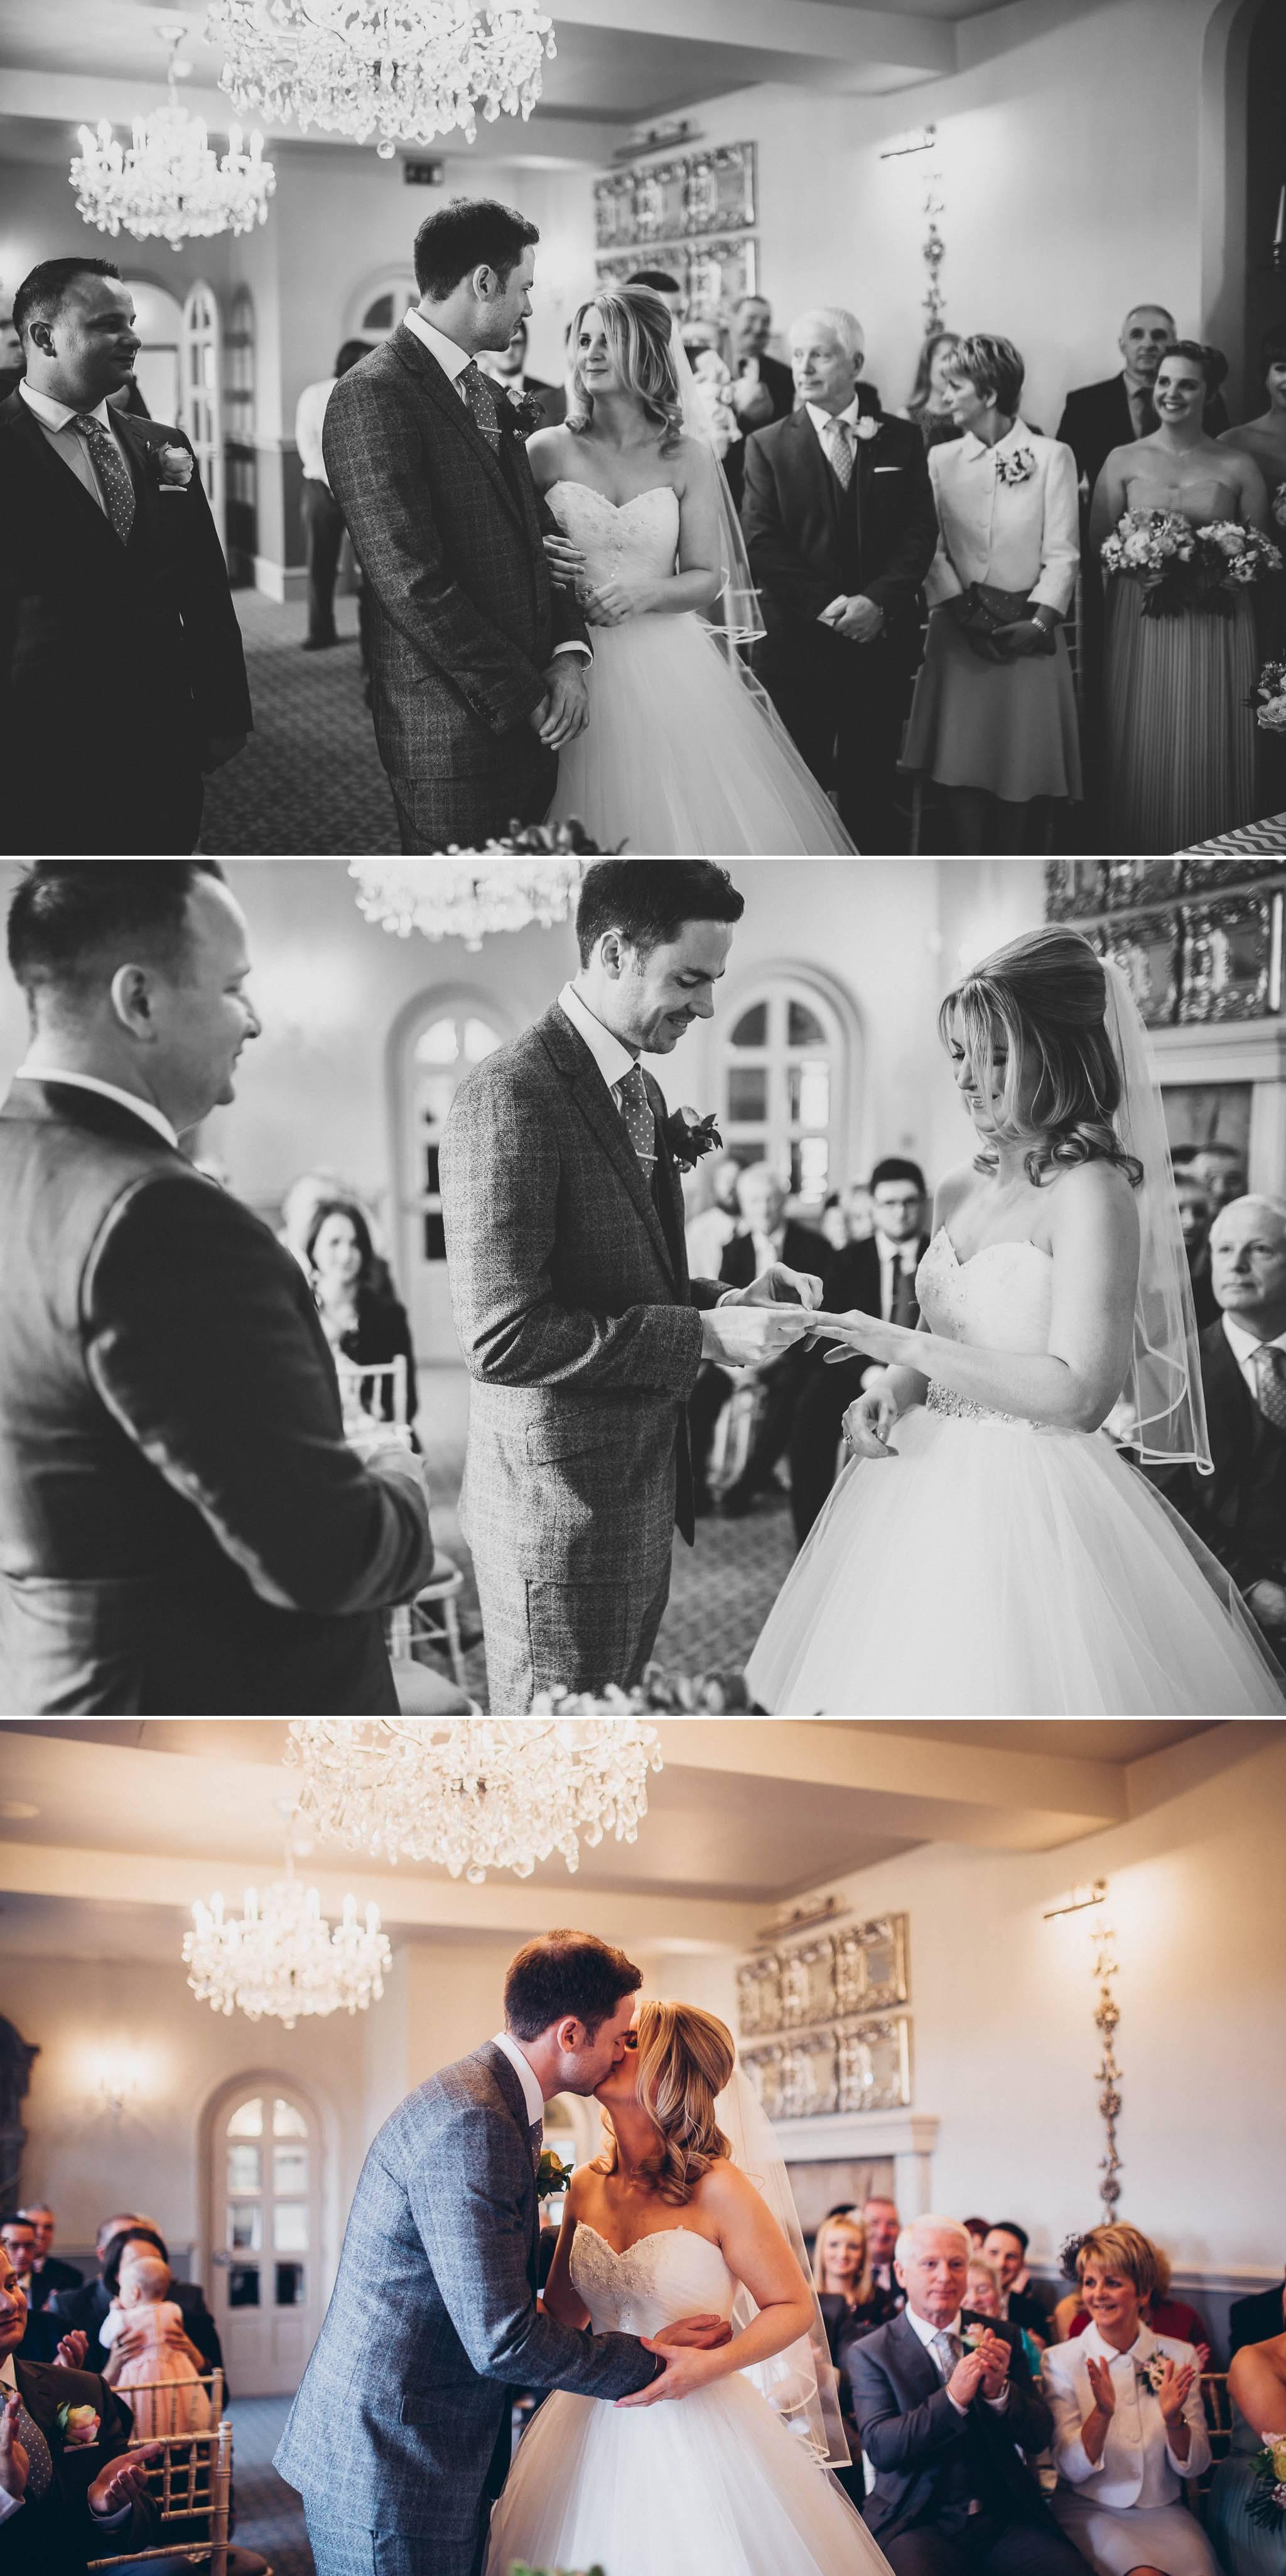 weston-hall-wedding-photographer 7.jpg